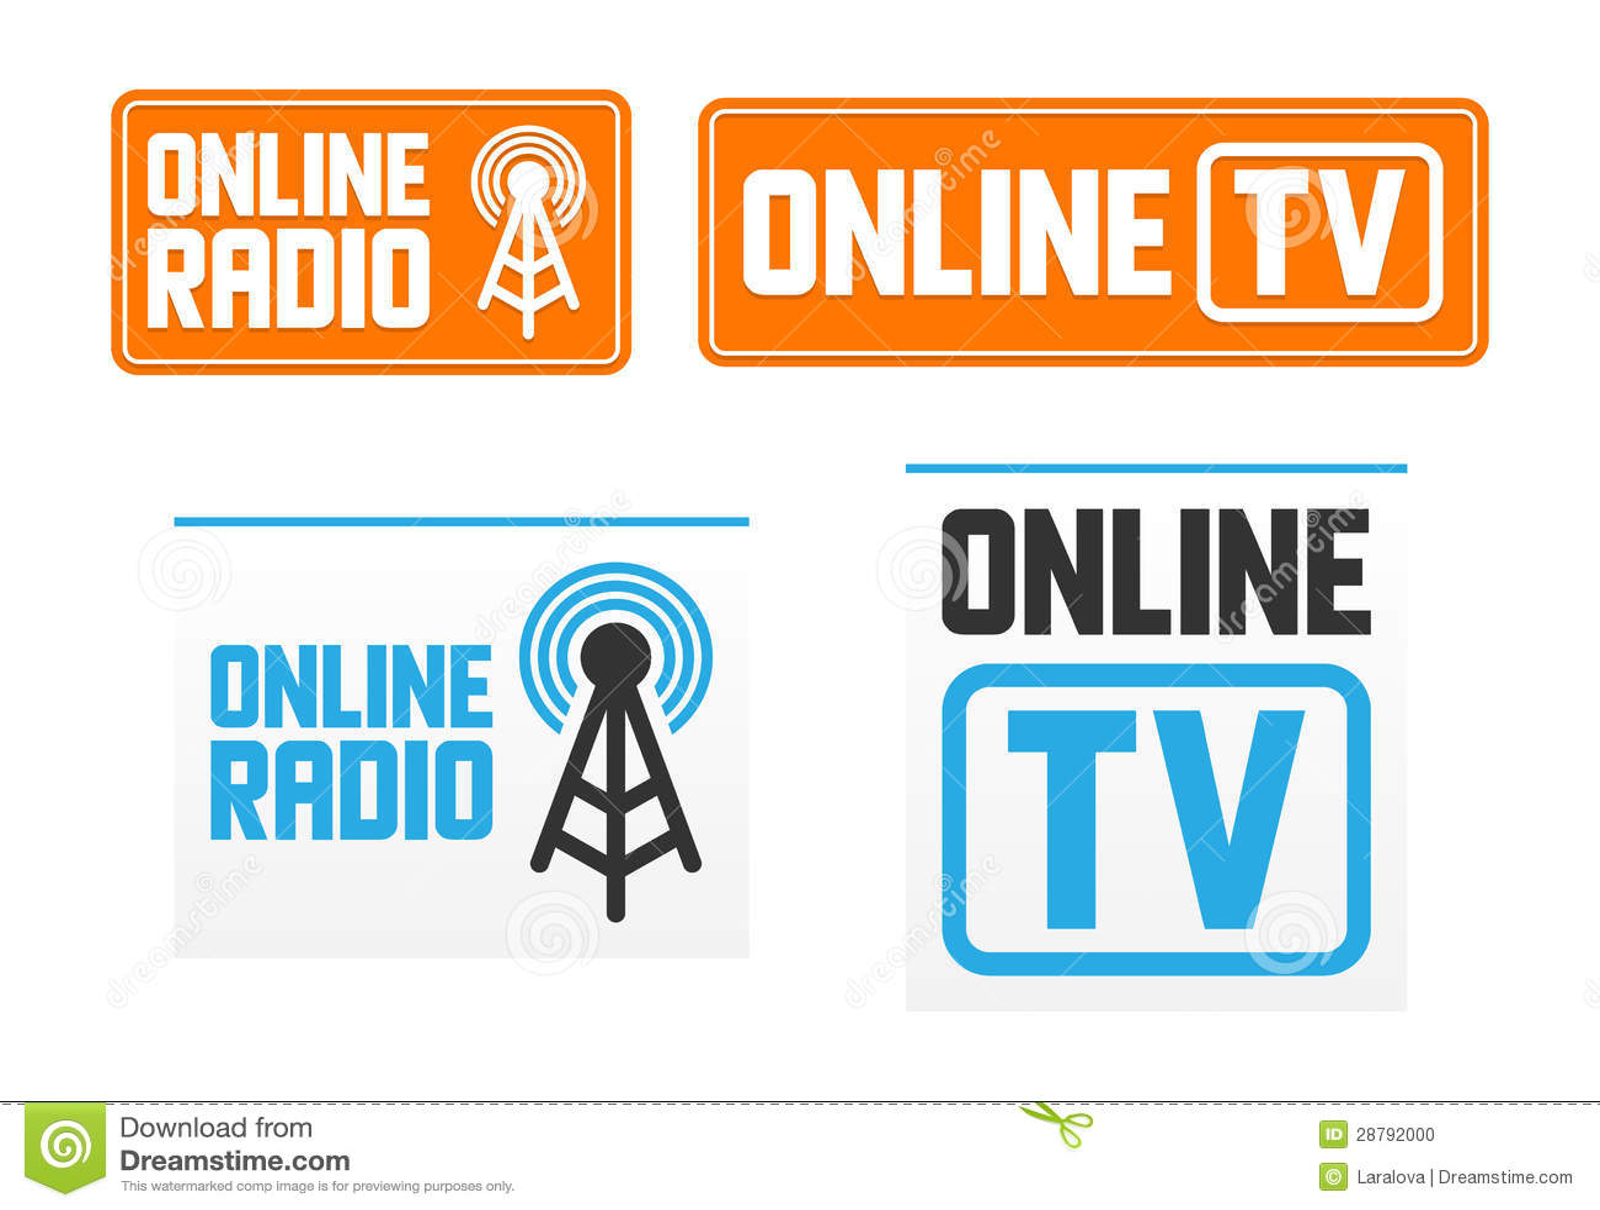 Radio station business plan free download